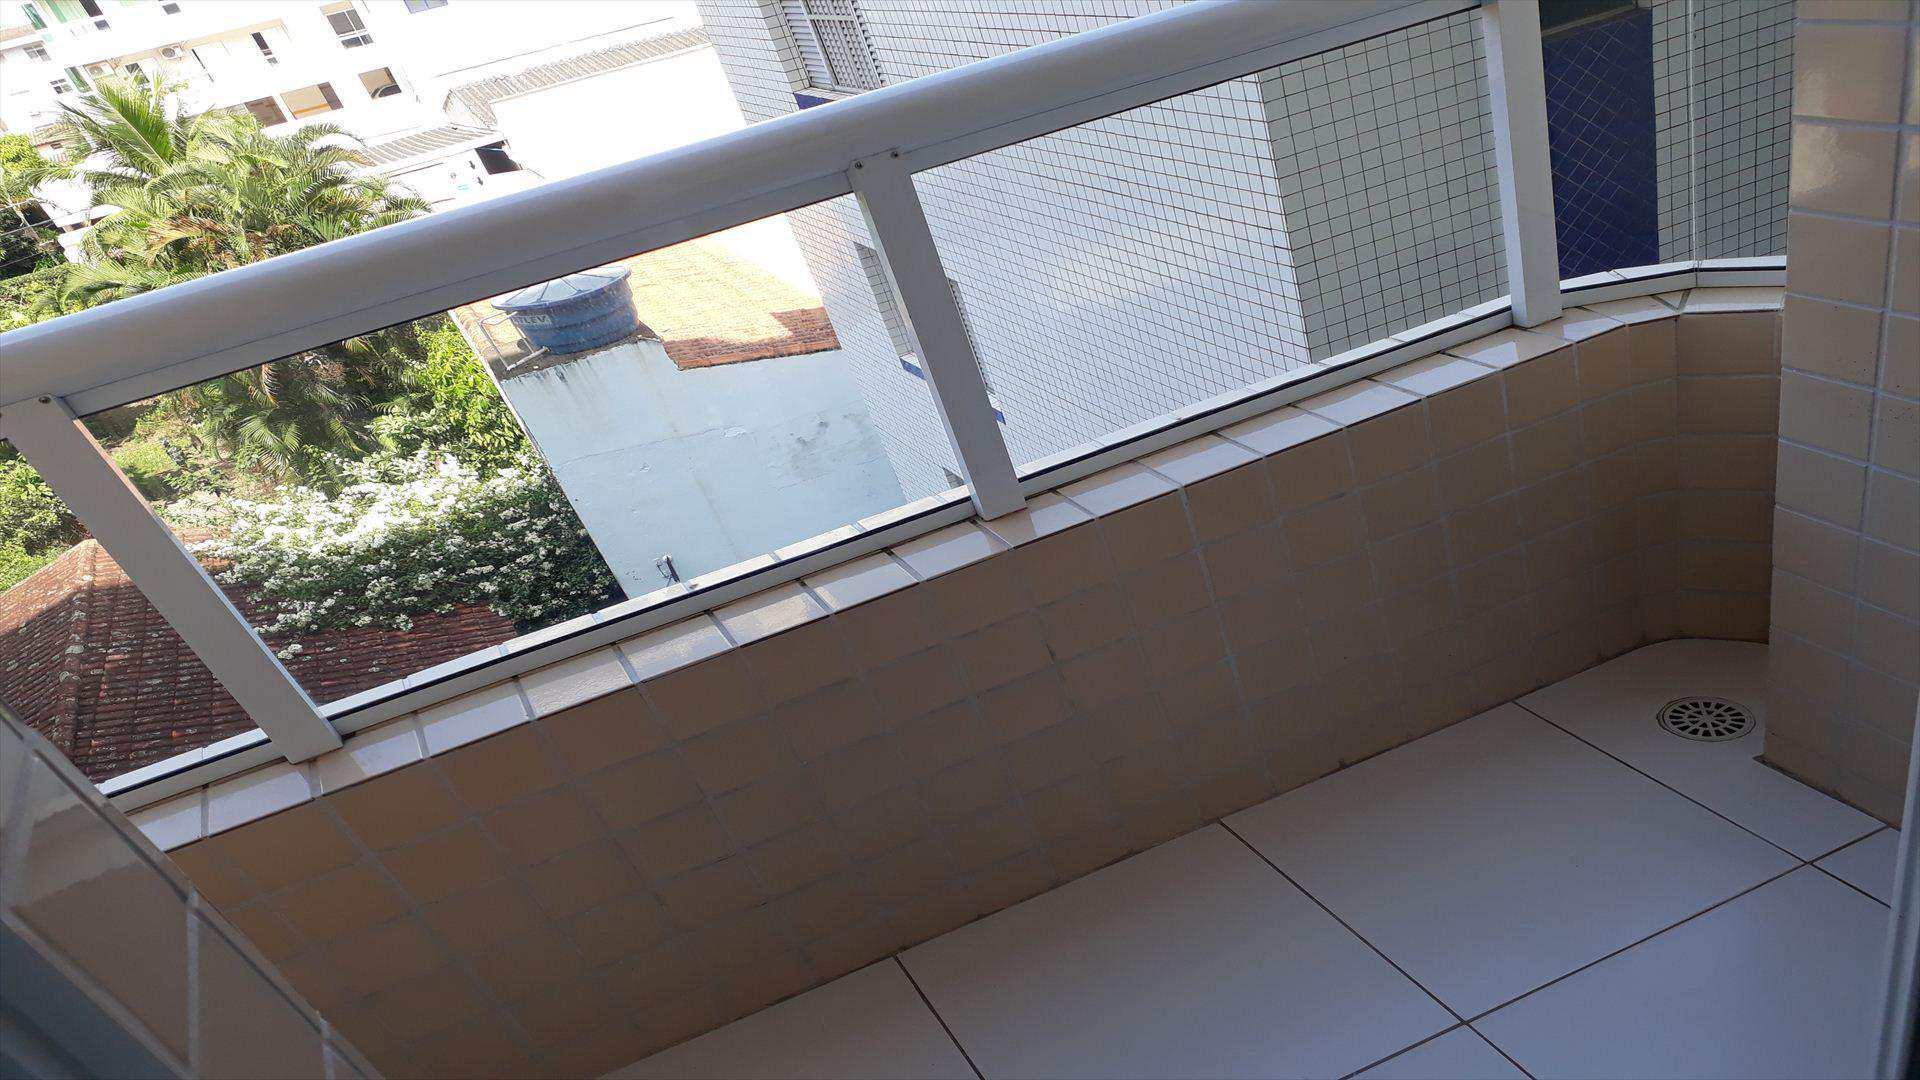 182600-05_SACADA.jpg